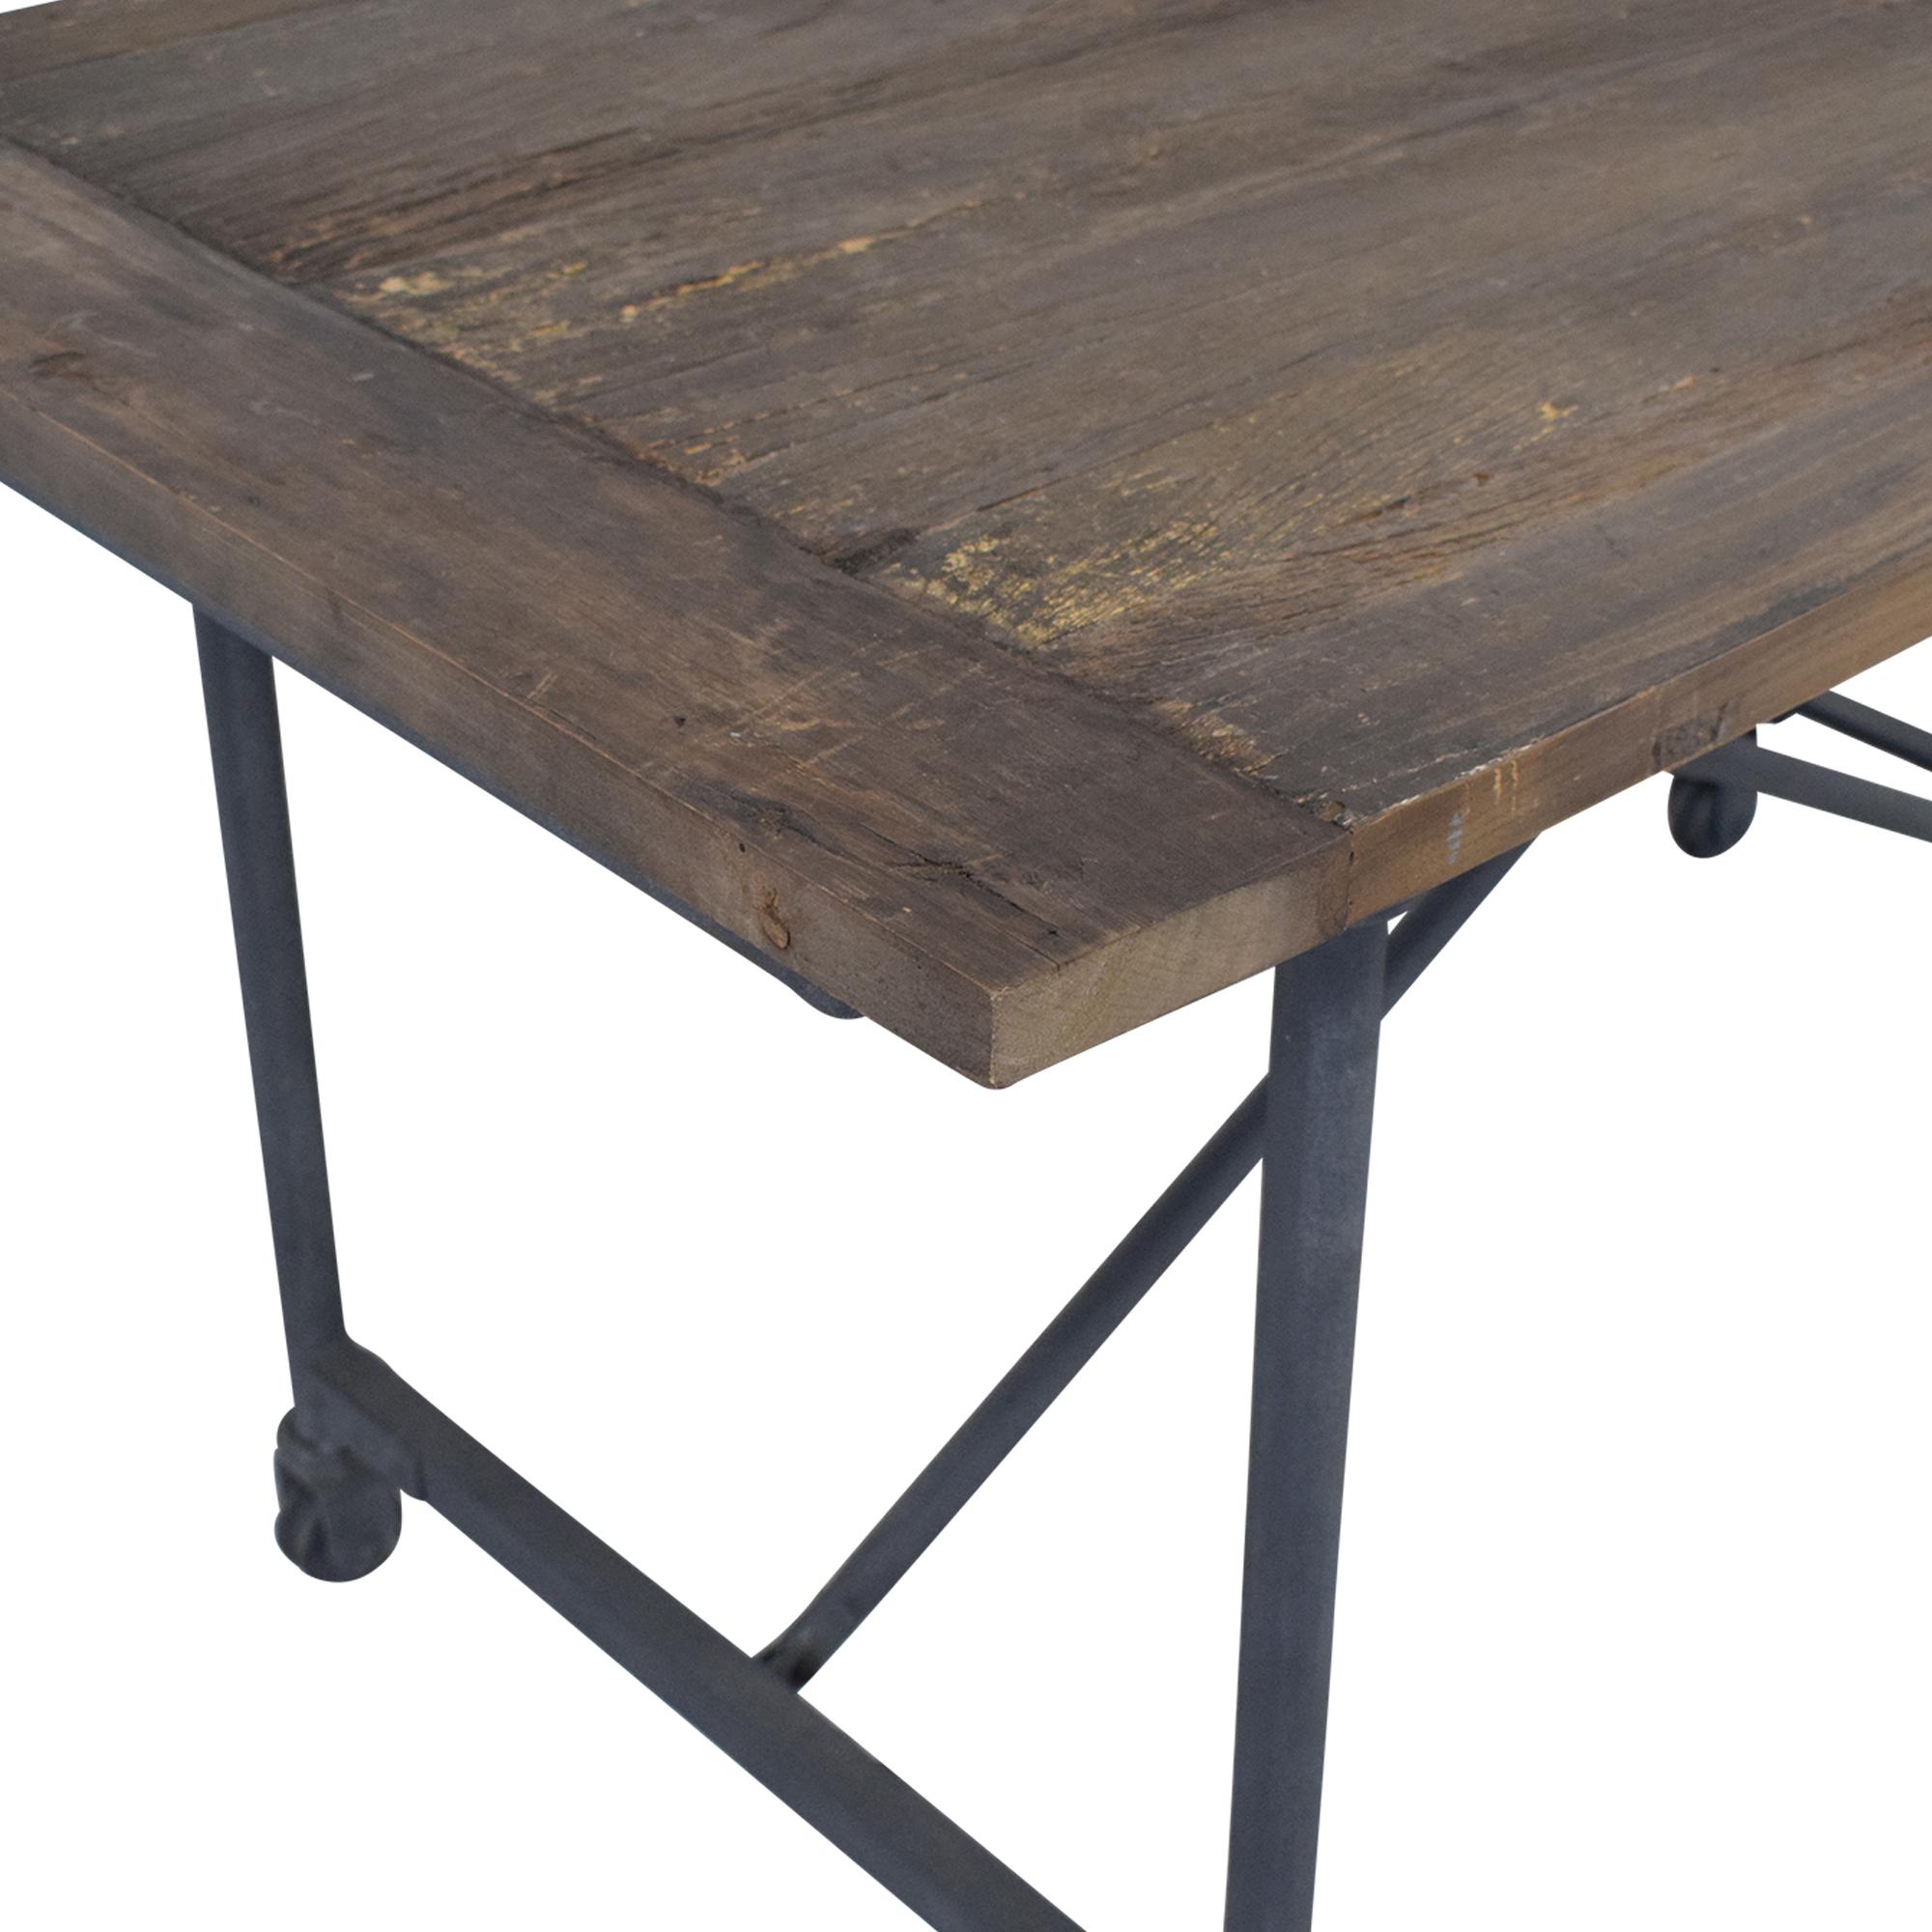 Restoration Hardware Restoration Hardware Flatiron Desk Reclaimed Natural Elm Zinc Metal price